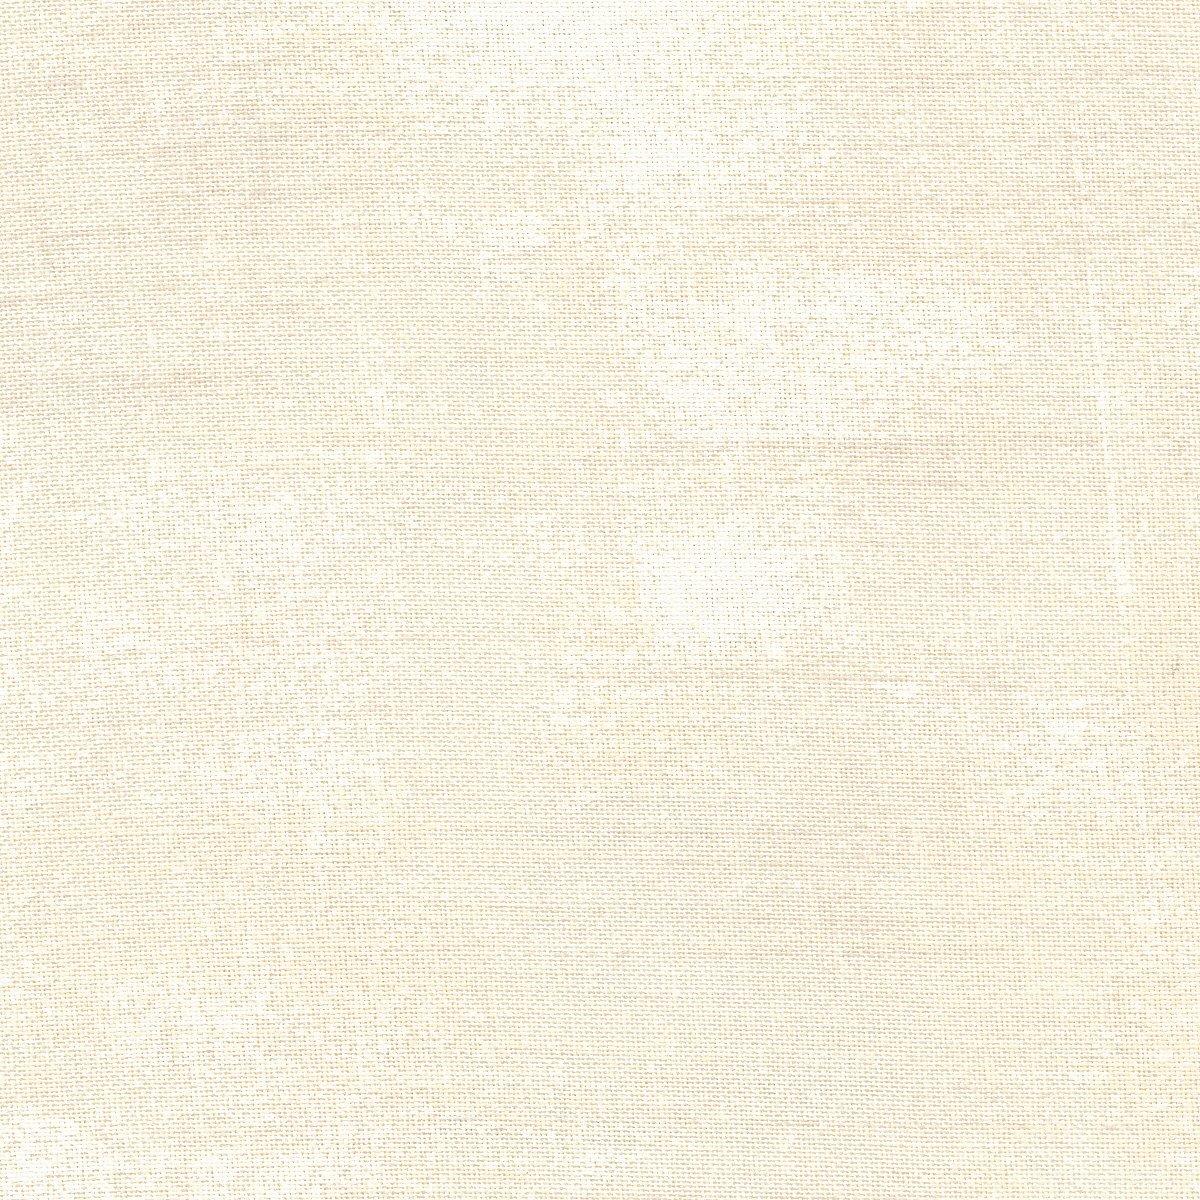 Grunge Basics  - Winter White - 530150-426